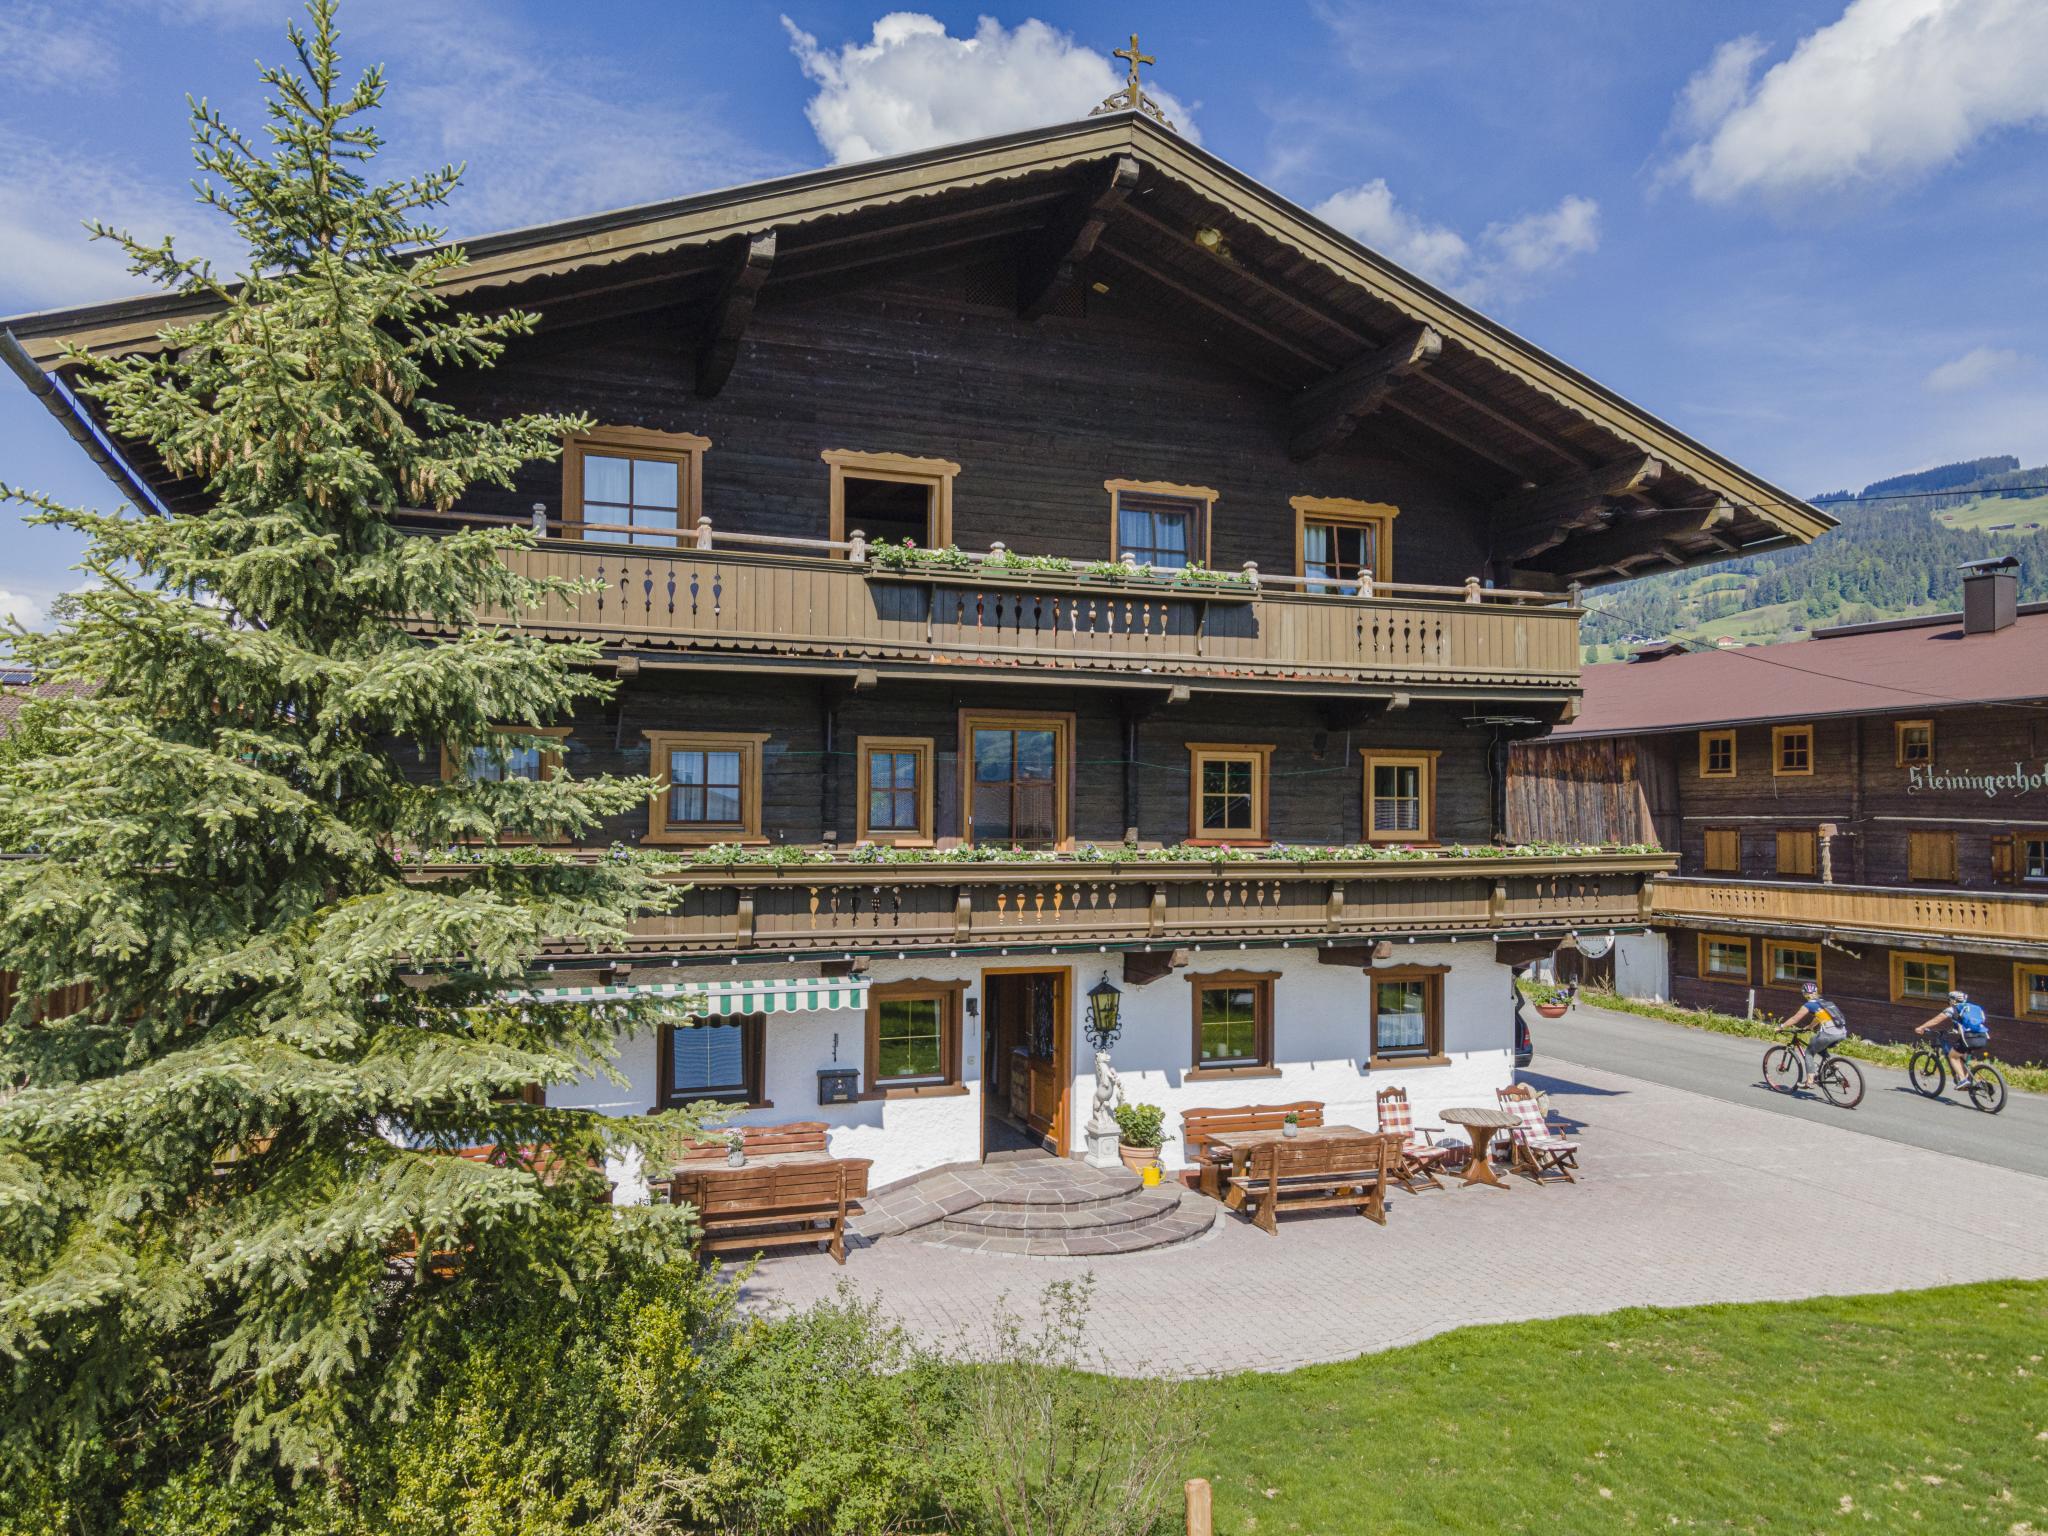 Weberhof Top 1 2 3 4 5 Tirol